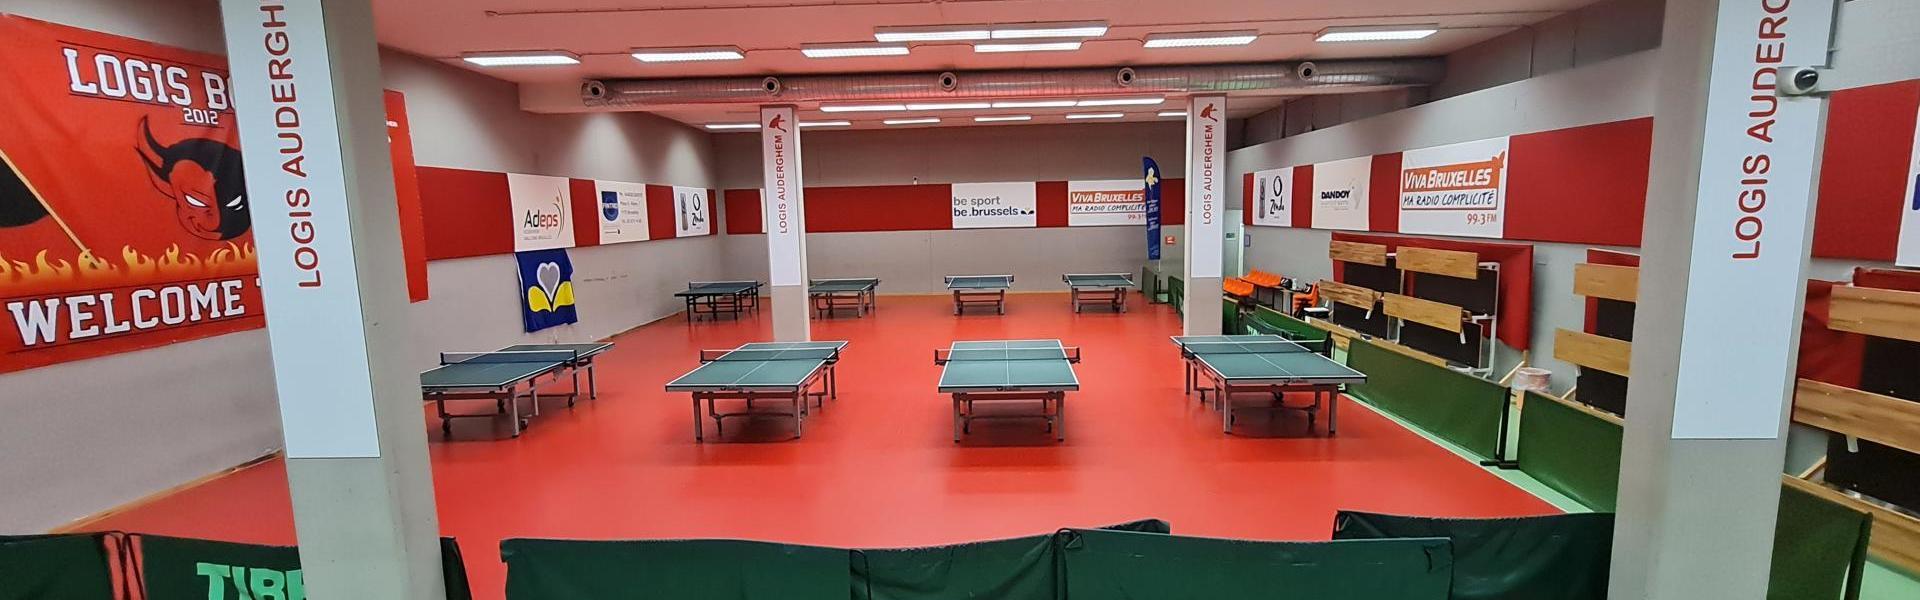 Salle de superdivision (vide) (Copyright : Antoine Betas)